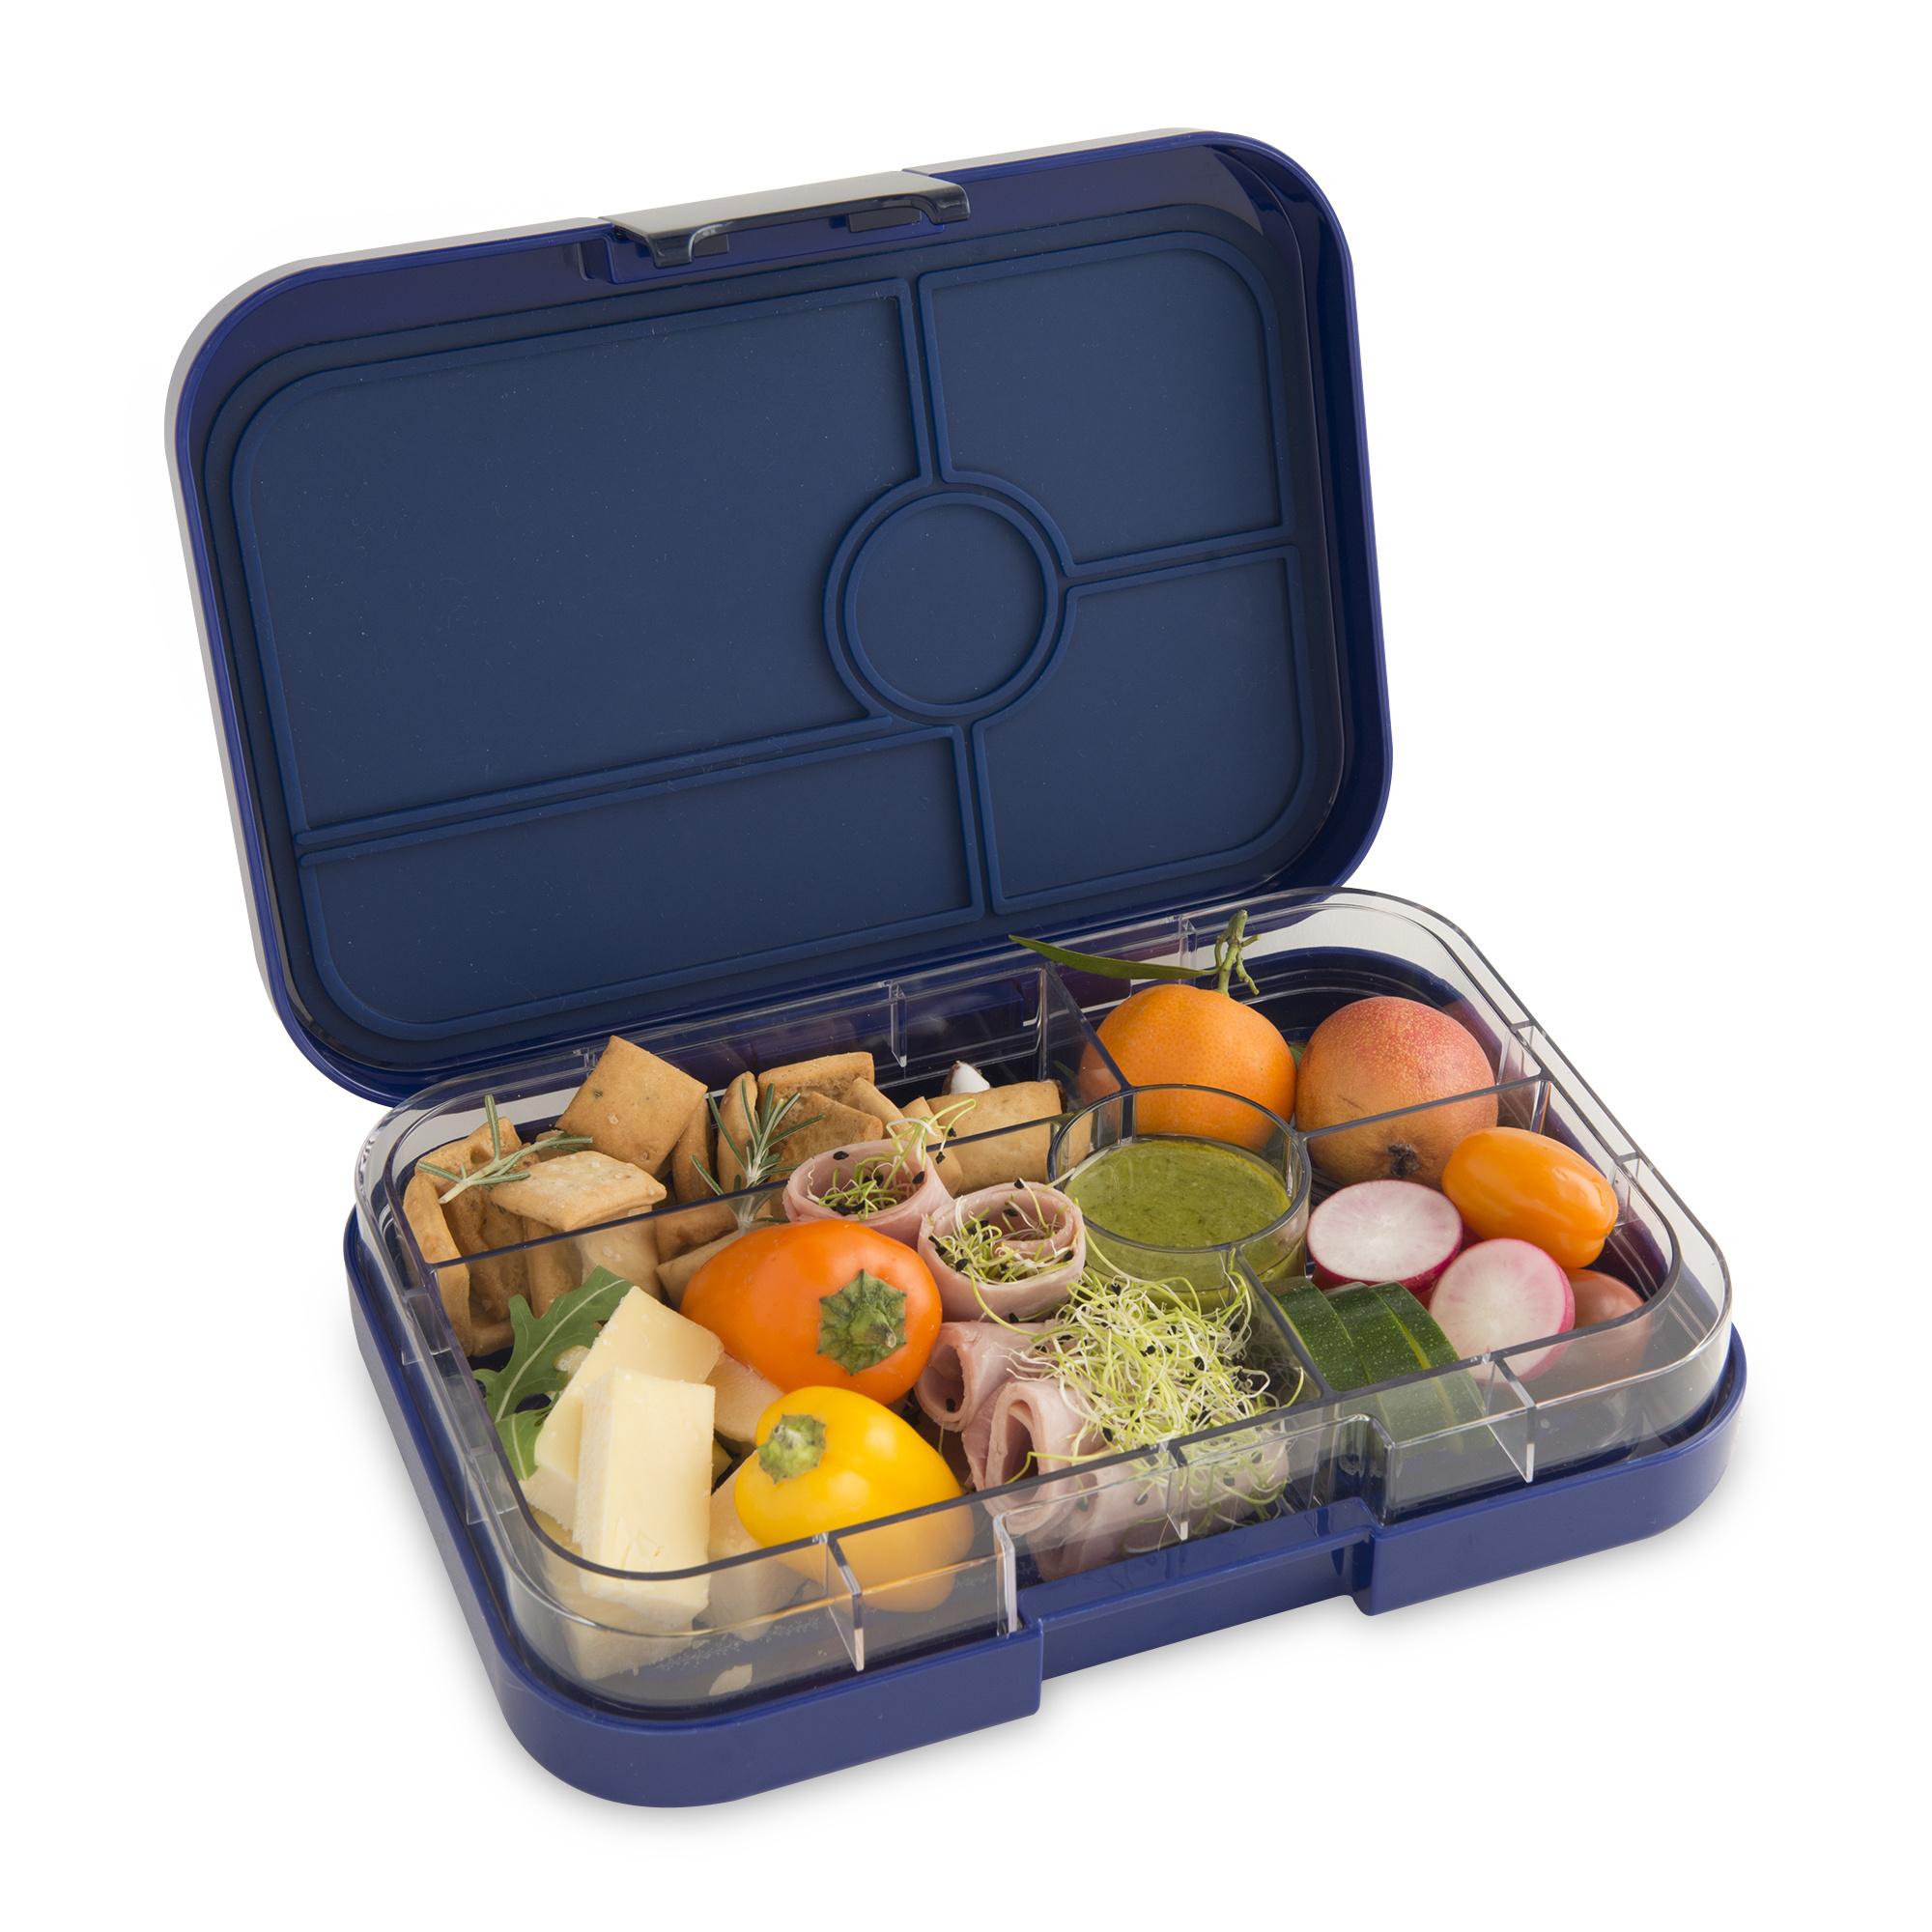 Yumbox Tapas XL 5-sections Portofino blue / Bon appetit tray-5